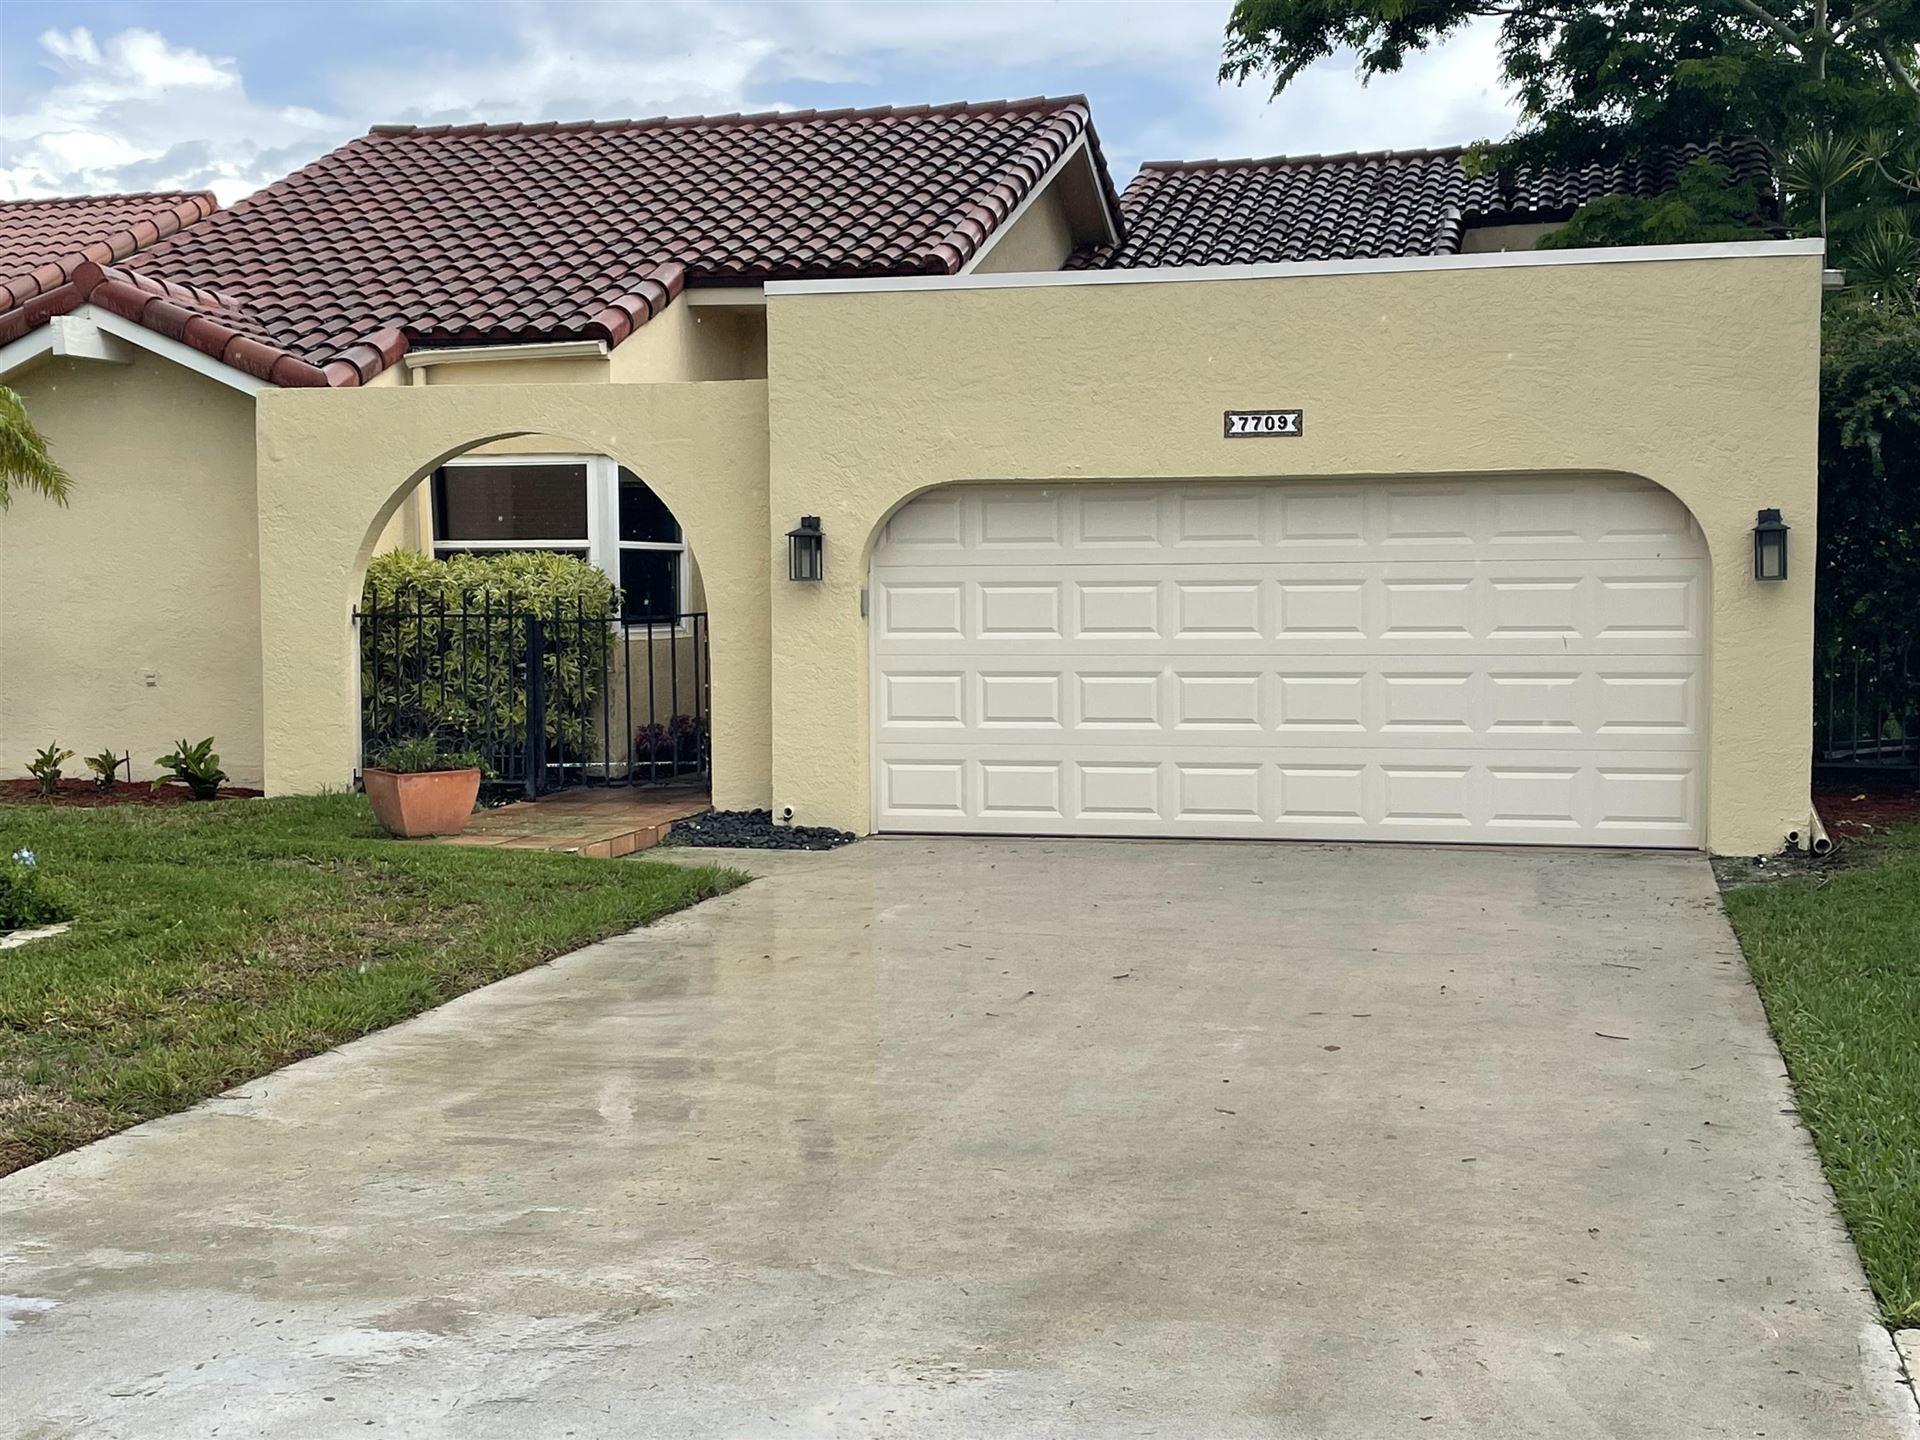 7709 Solimar Circle, Boca Raton, FL 33433 - MLS#: RX-10728613